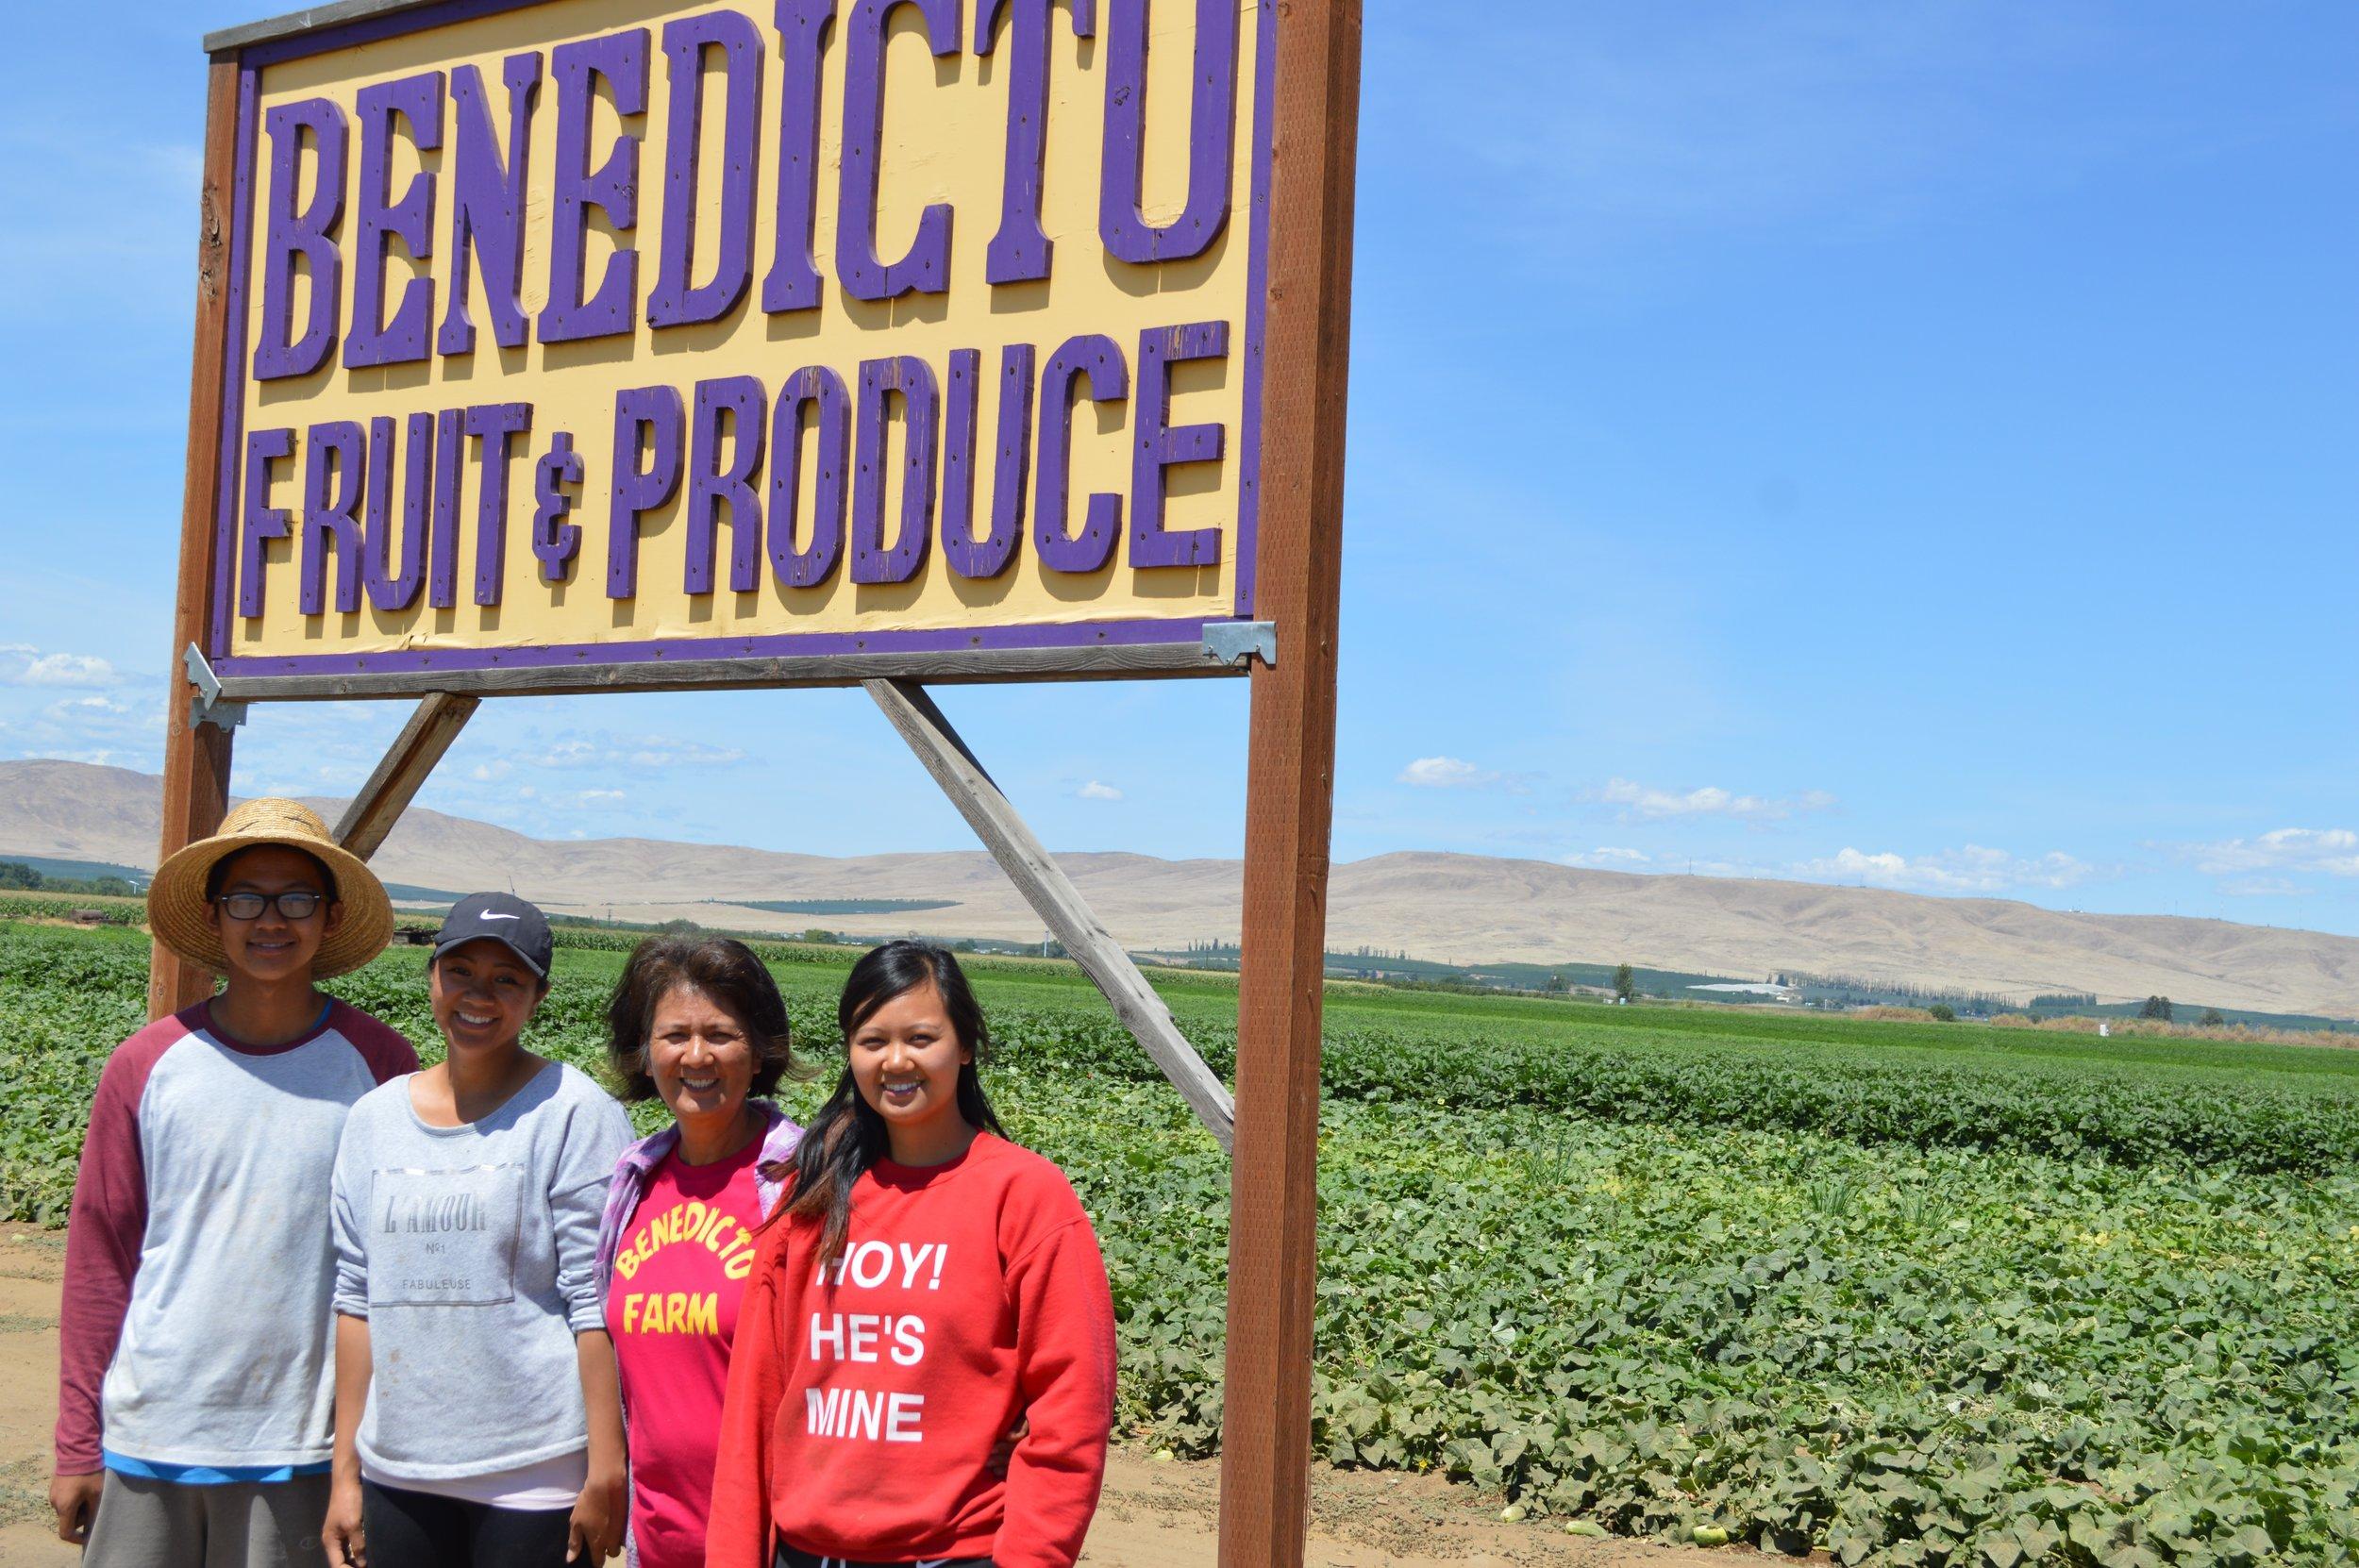 Benedicto farm.jpg